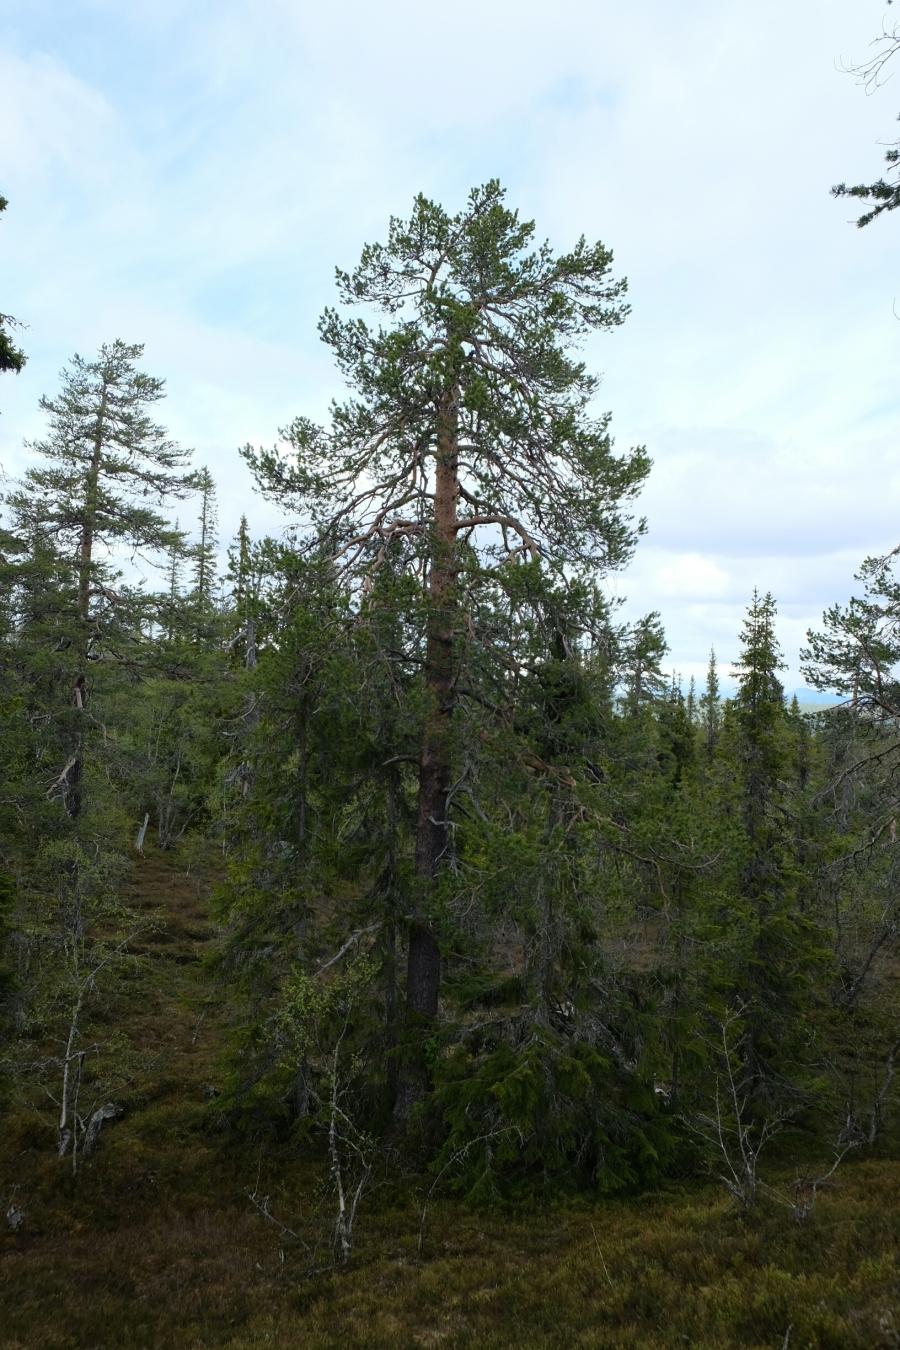 Föhre im Fulufjäll Nationalpark